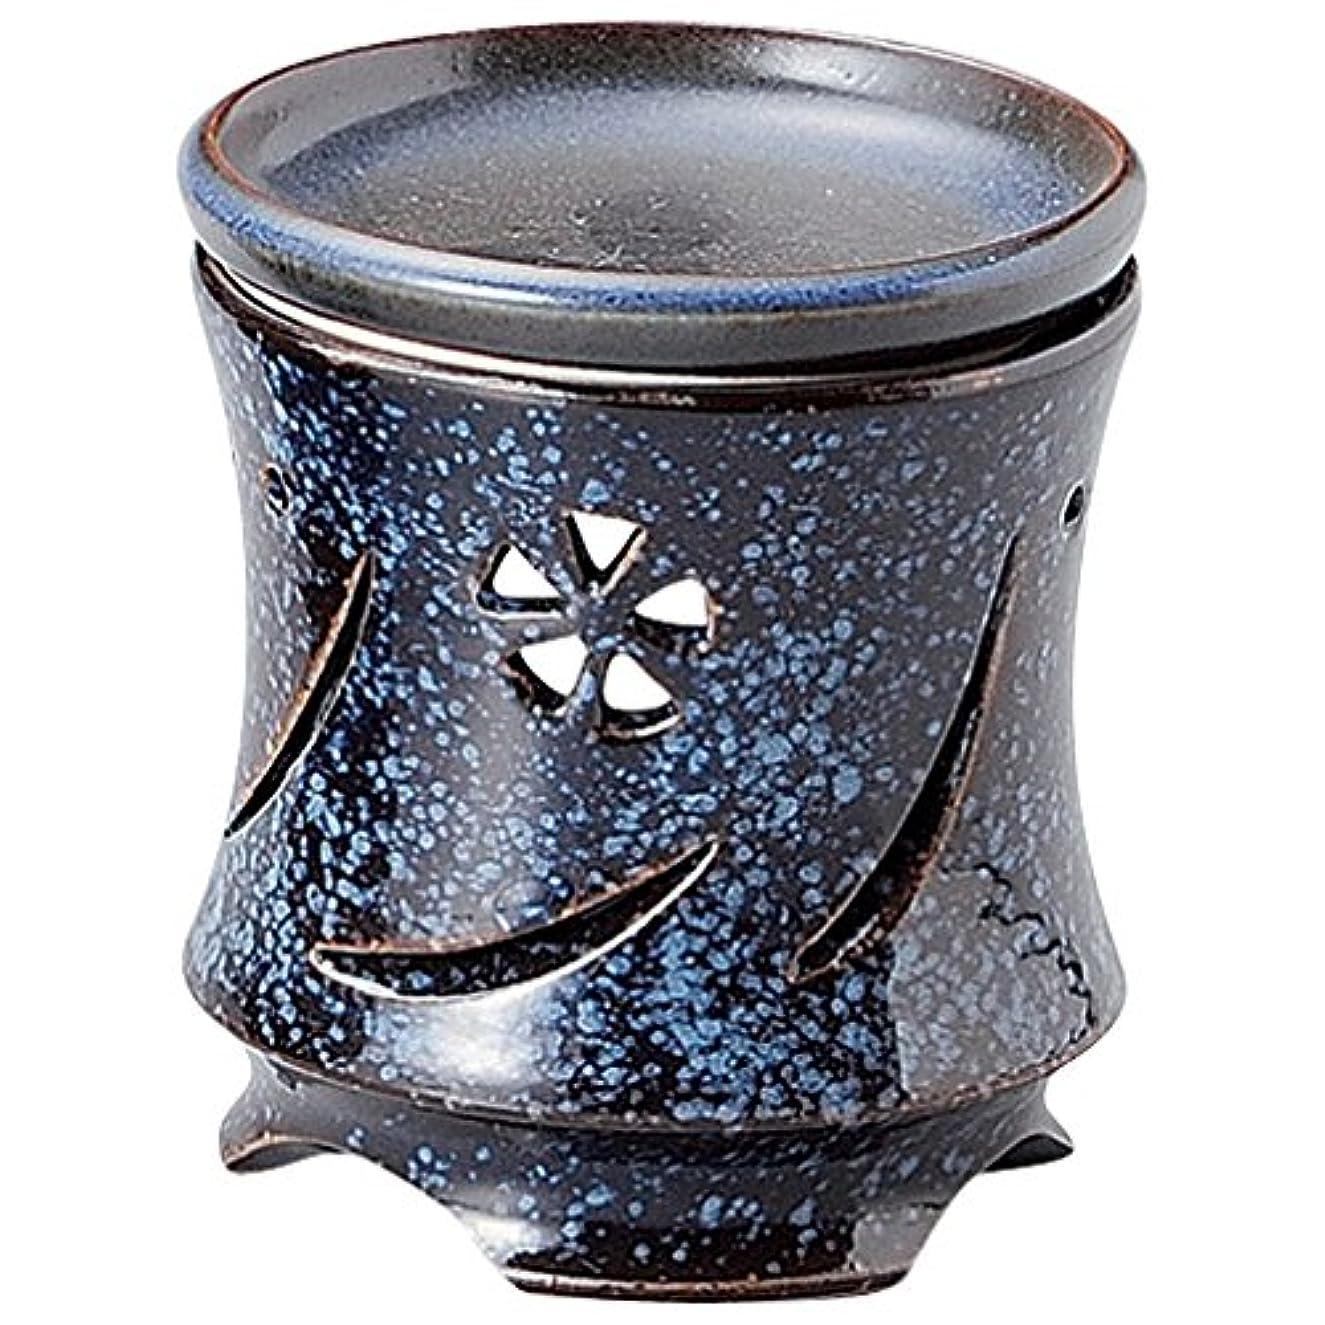 地下室店主尊敬山下工芸 常滑焼 富仙生子すかし彫茶香炉 10.5×9.5×9.5cm 13045610